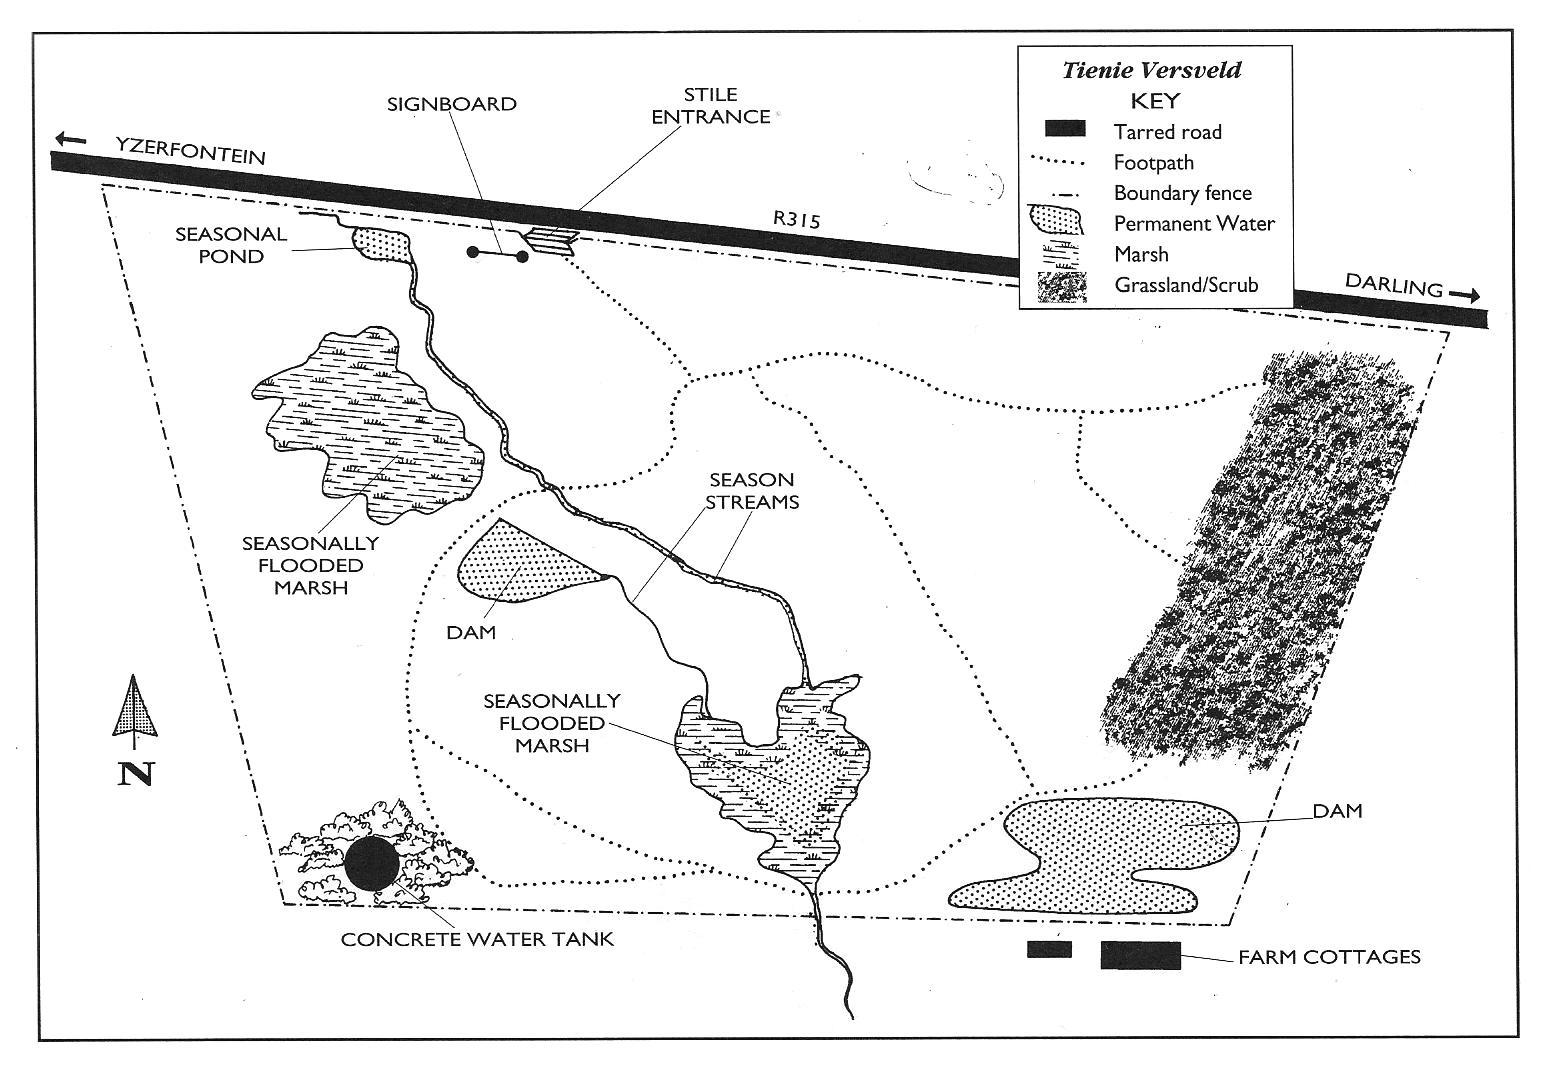 Tienie Versveld site map